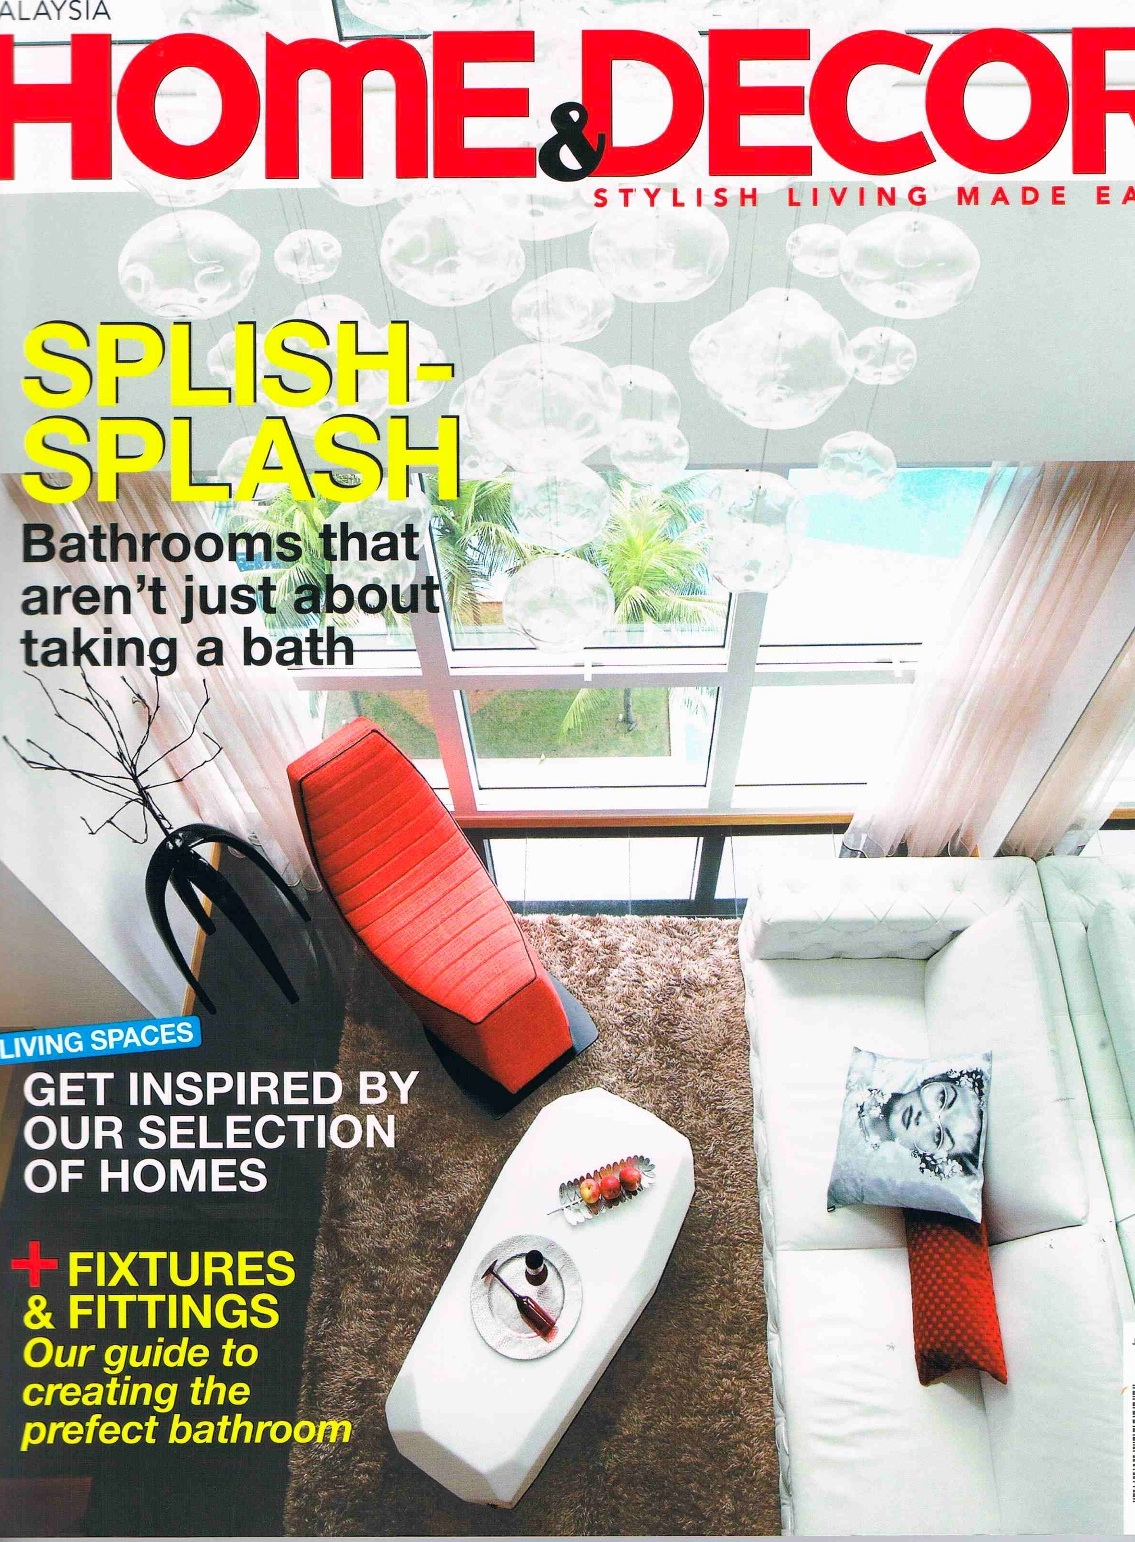 Best Home Decor Design Magazines Top Home Decor Magazines Trina